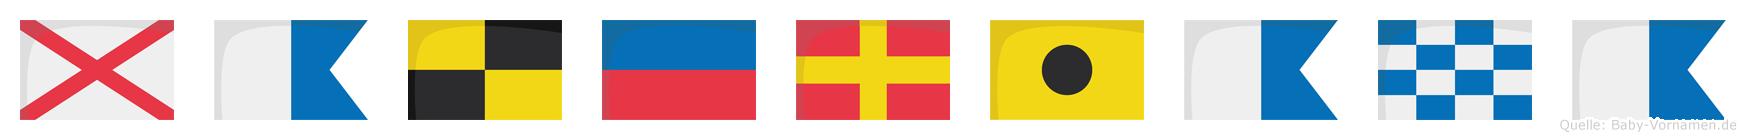 Valeriana im Flaggenalphabet